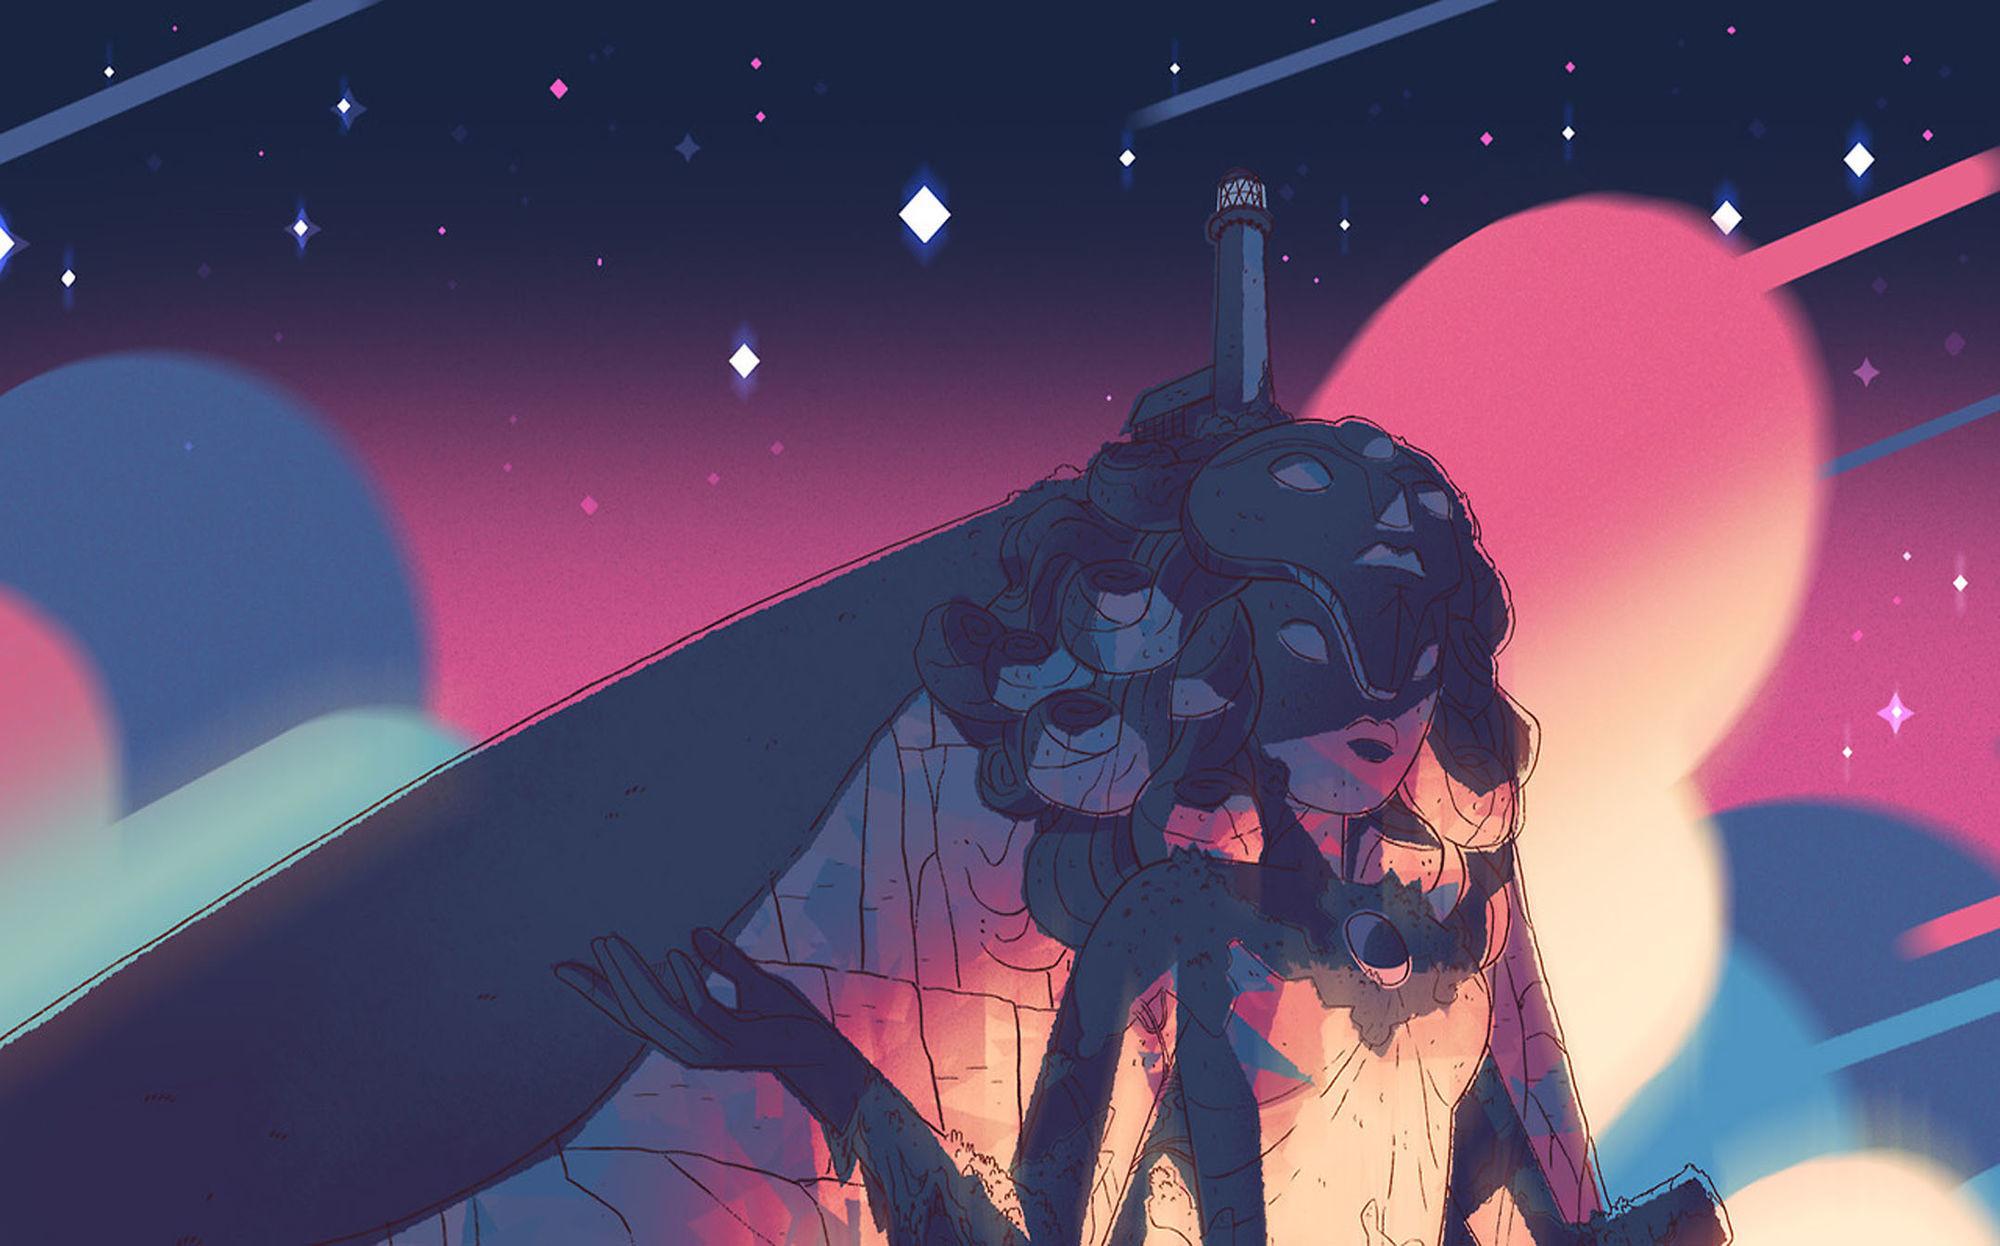 steven universe wallpaper | 2000px-20140716224241%21Wiki-background.jpg